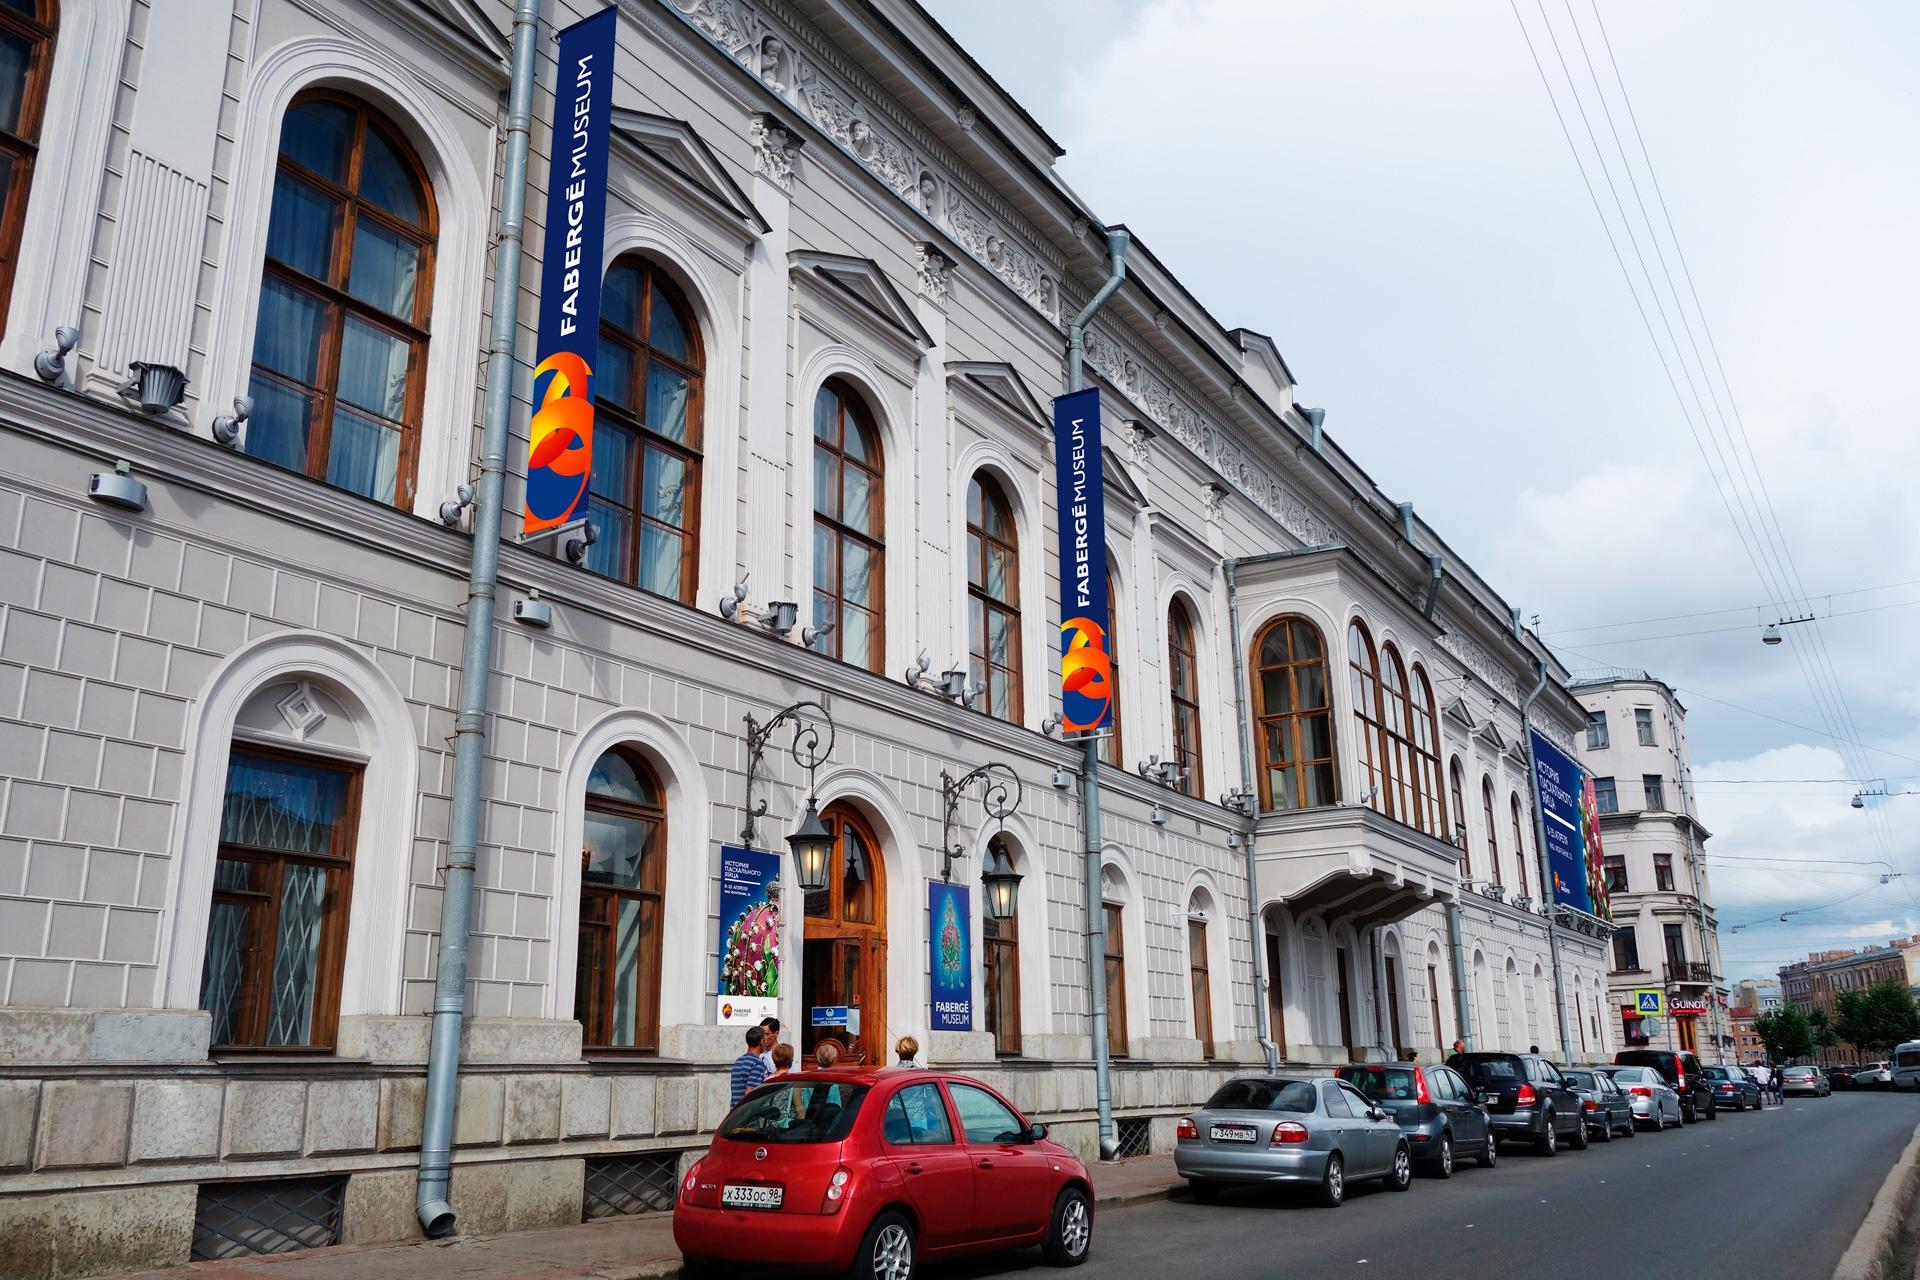 Faberge Museum, Музей Фаберже, Шуваловский дворец, баннер на фасаде, outside posters